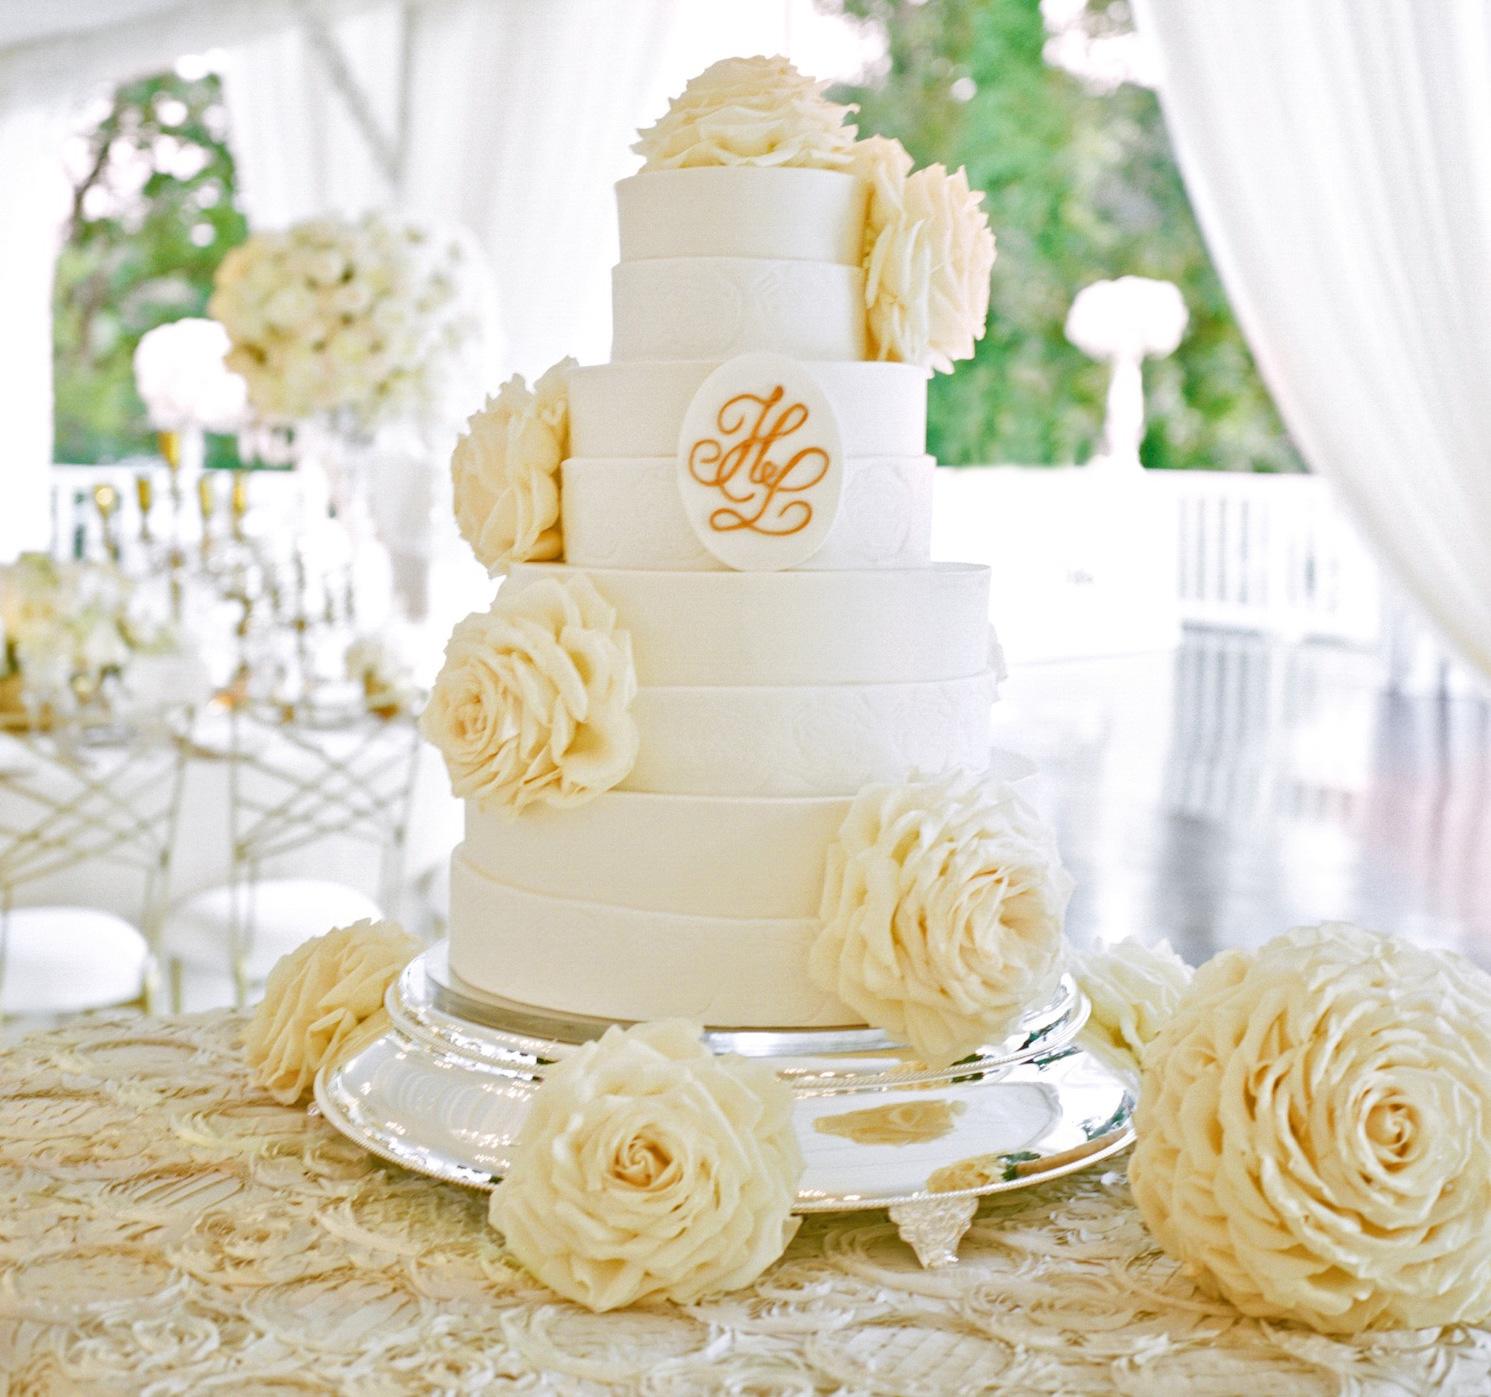 White wedding cake with monogram and glamelia flowers